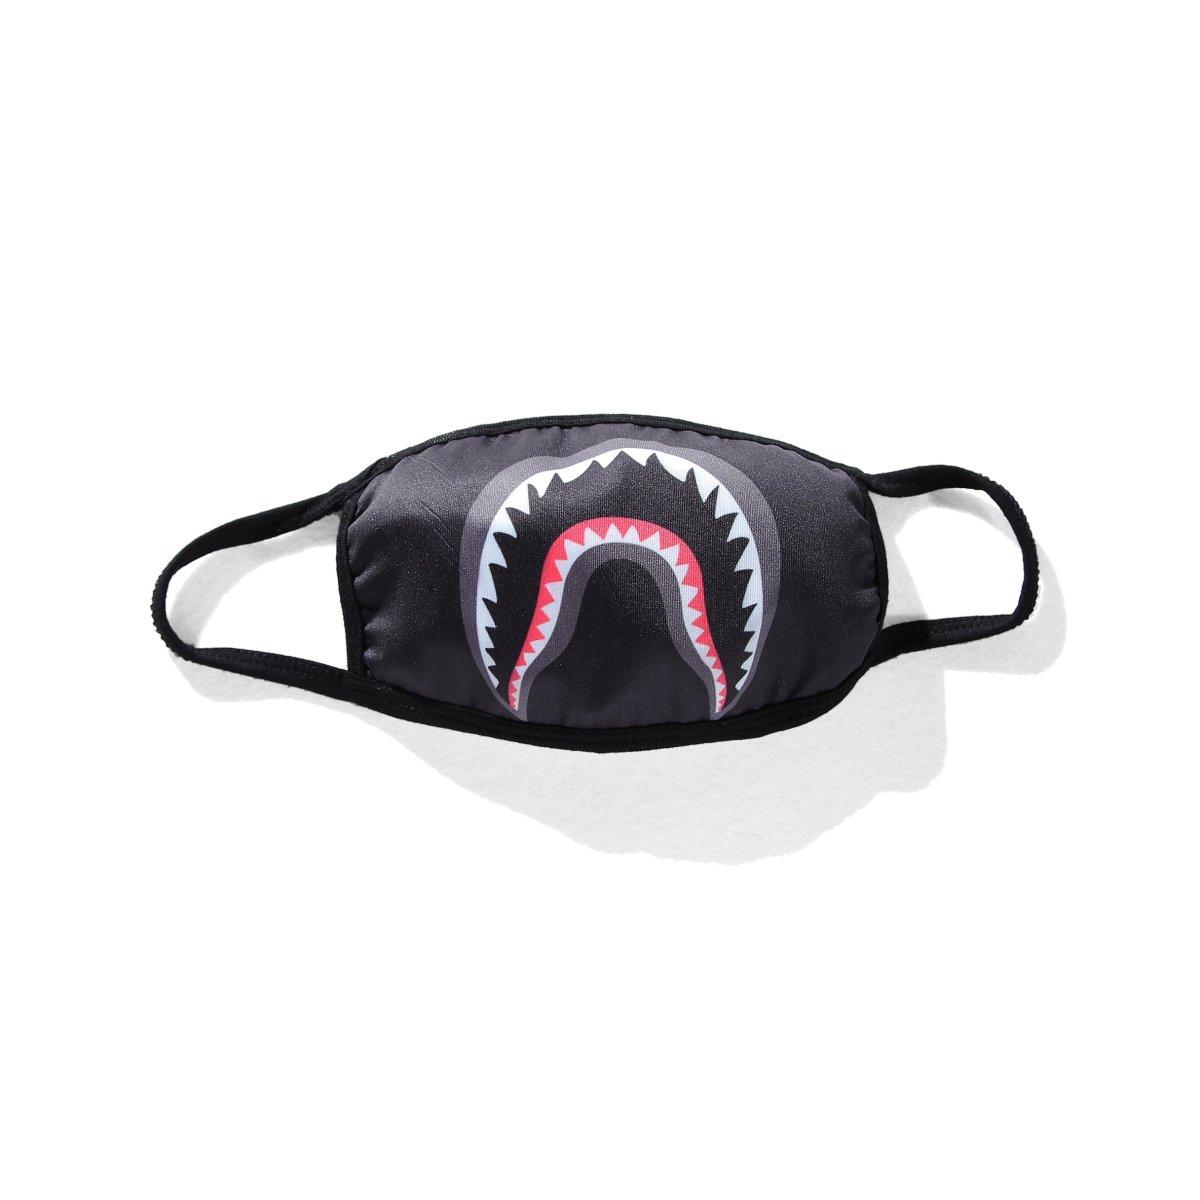 8d0089212331 Amazon.com  Camping First Aid Kits Bape Black Black Shark Face Mask  (black)  Health   Personal Care